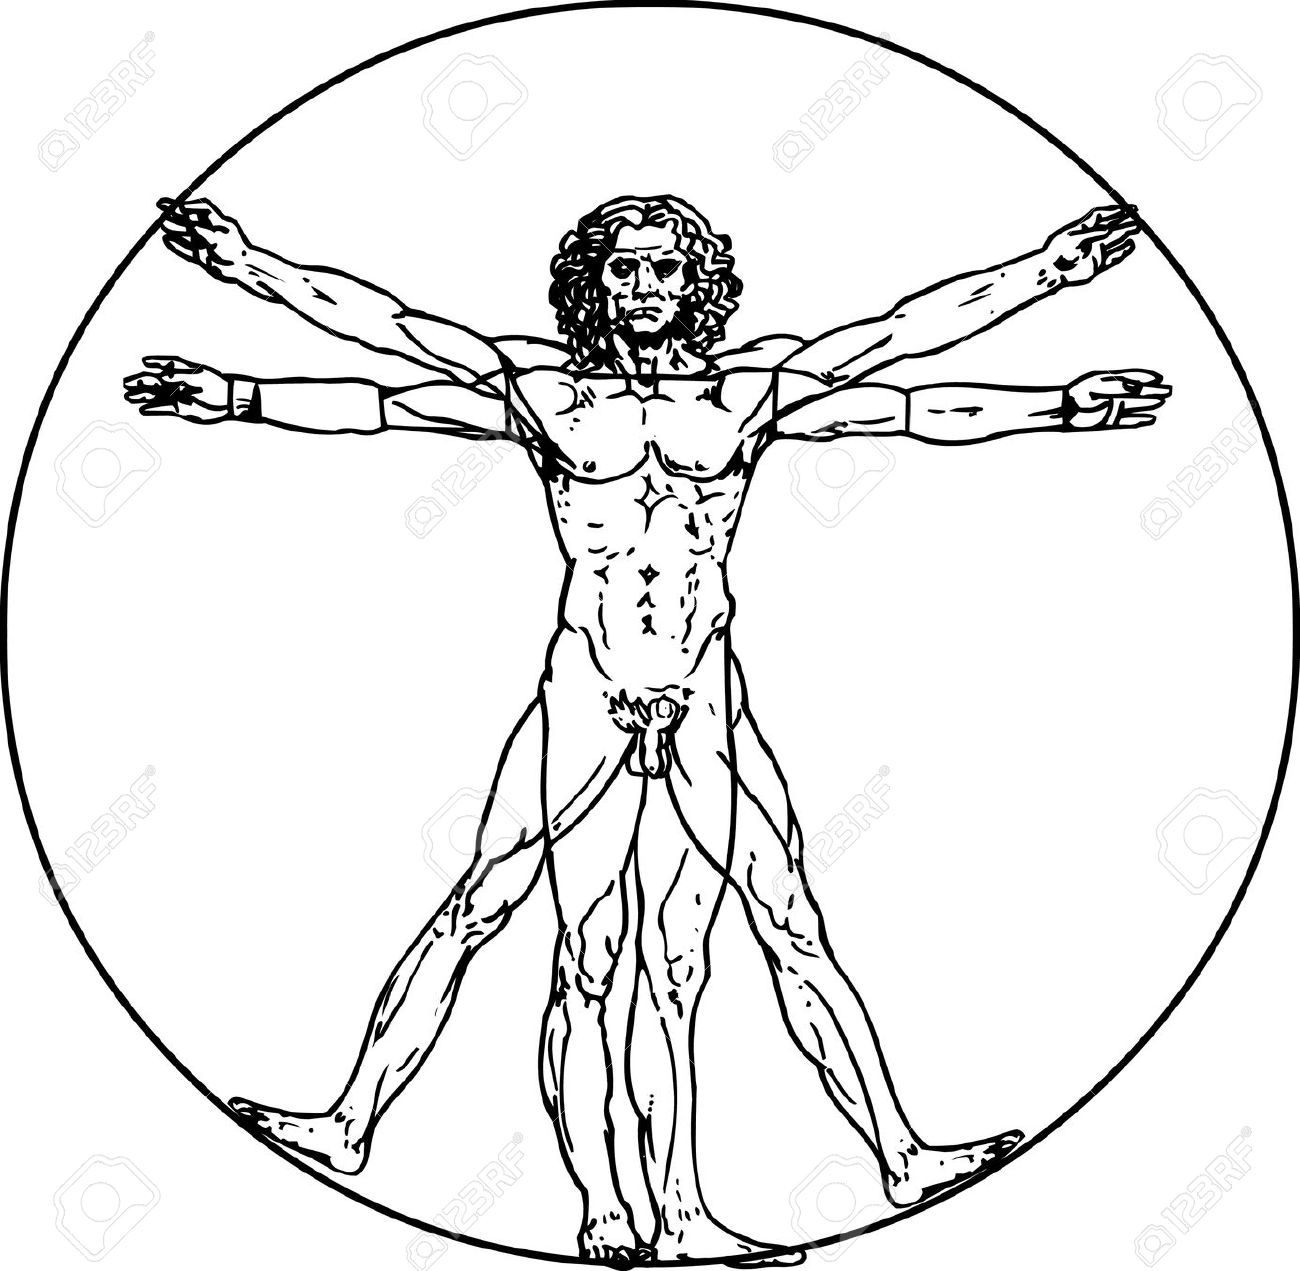 Vitruvian man and woman clipart.